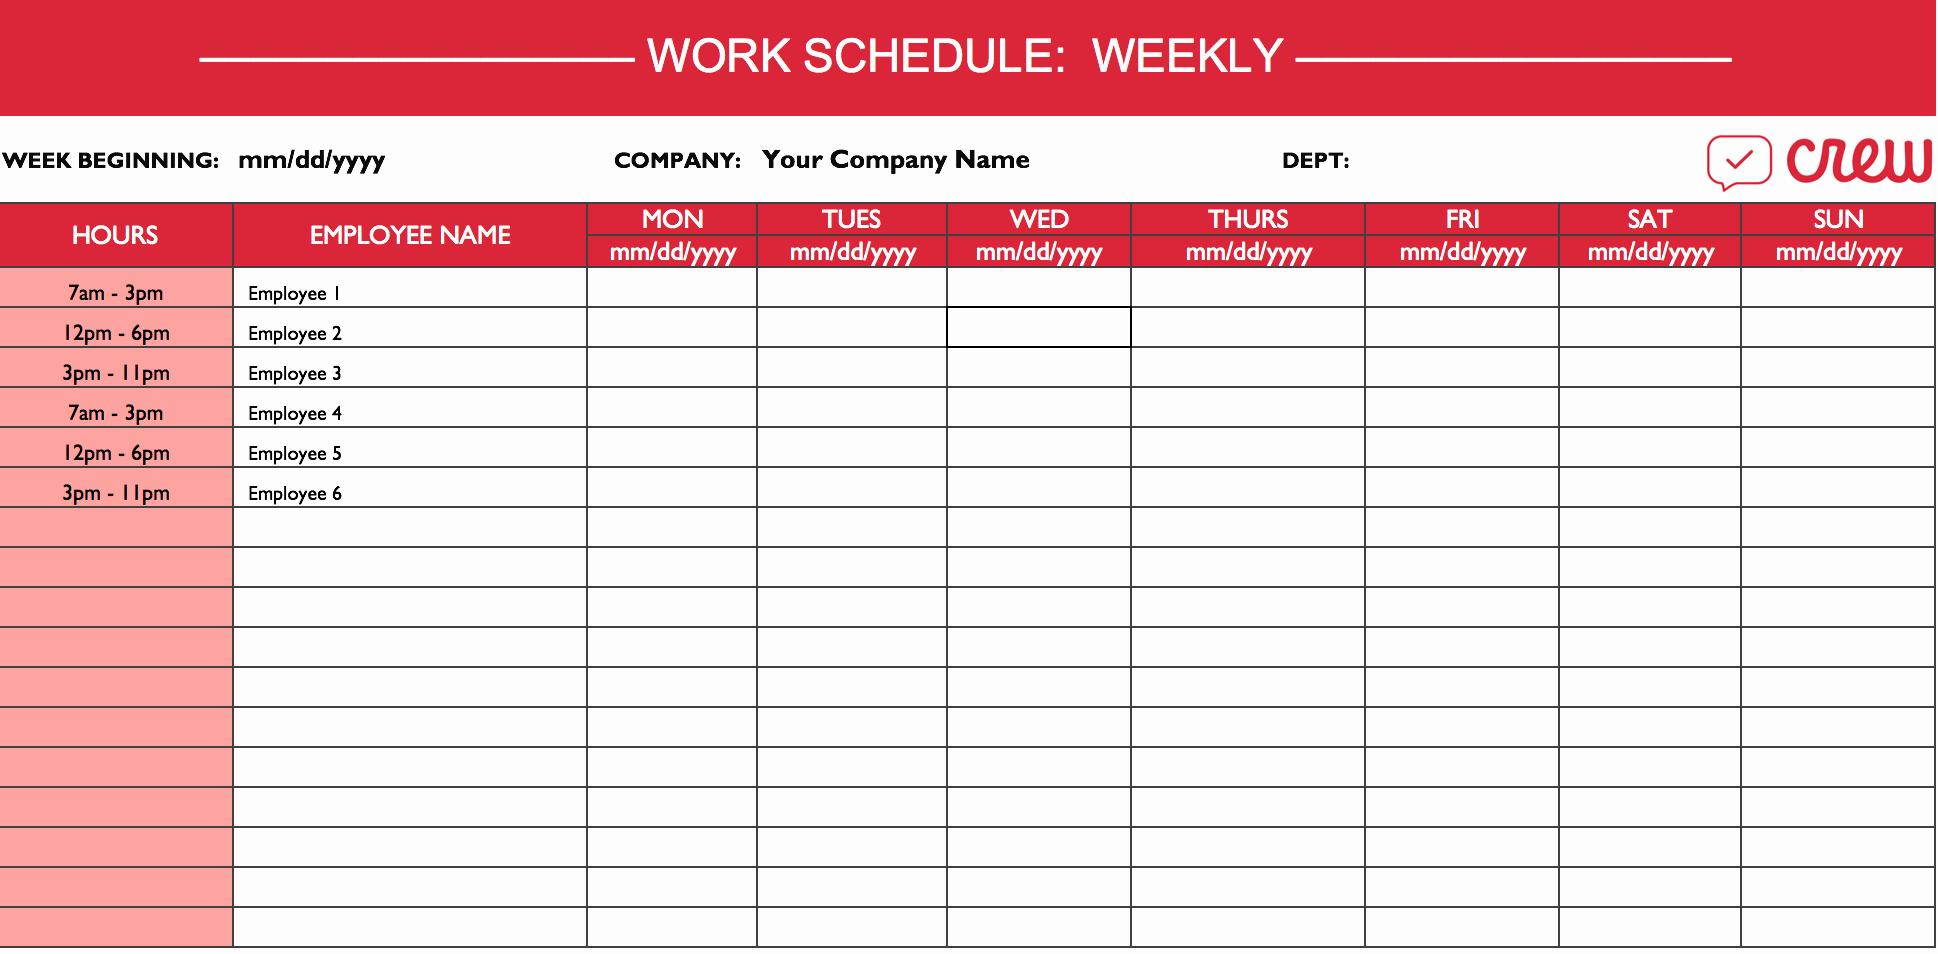 Employee Monthly Schedule Template Inspirational Weekly Work Schedule Template I Crew